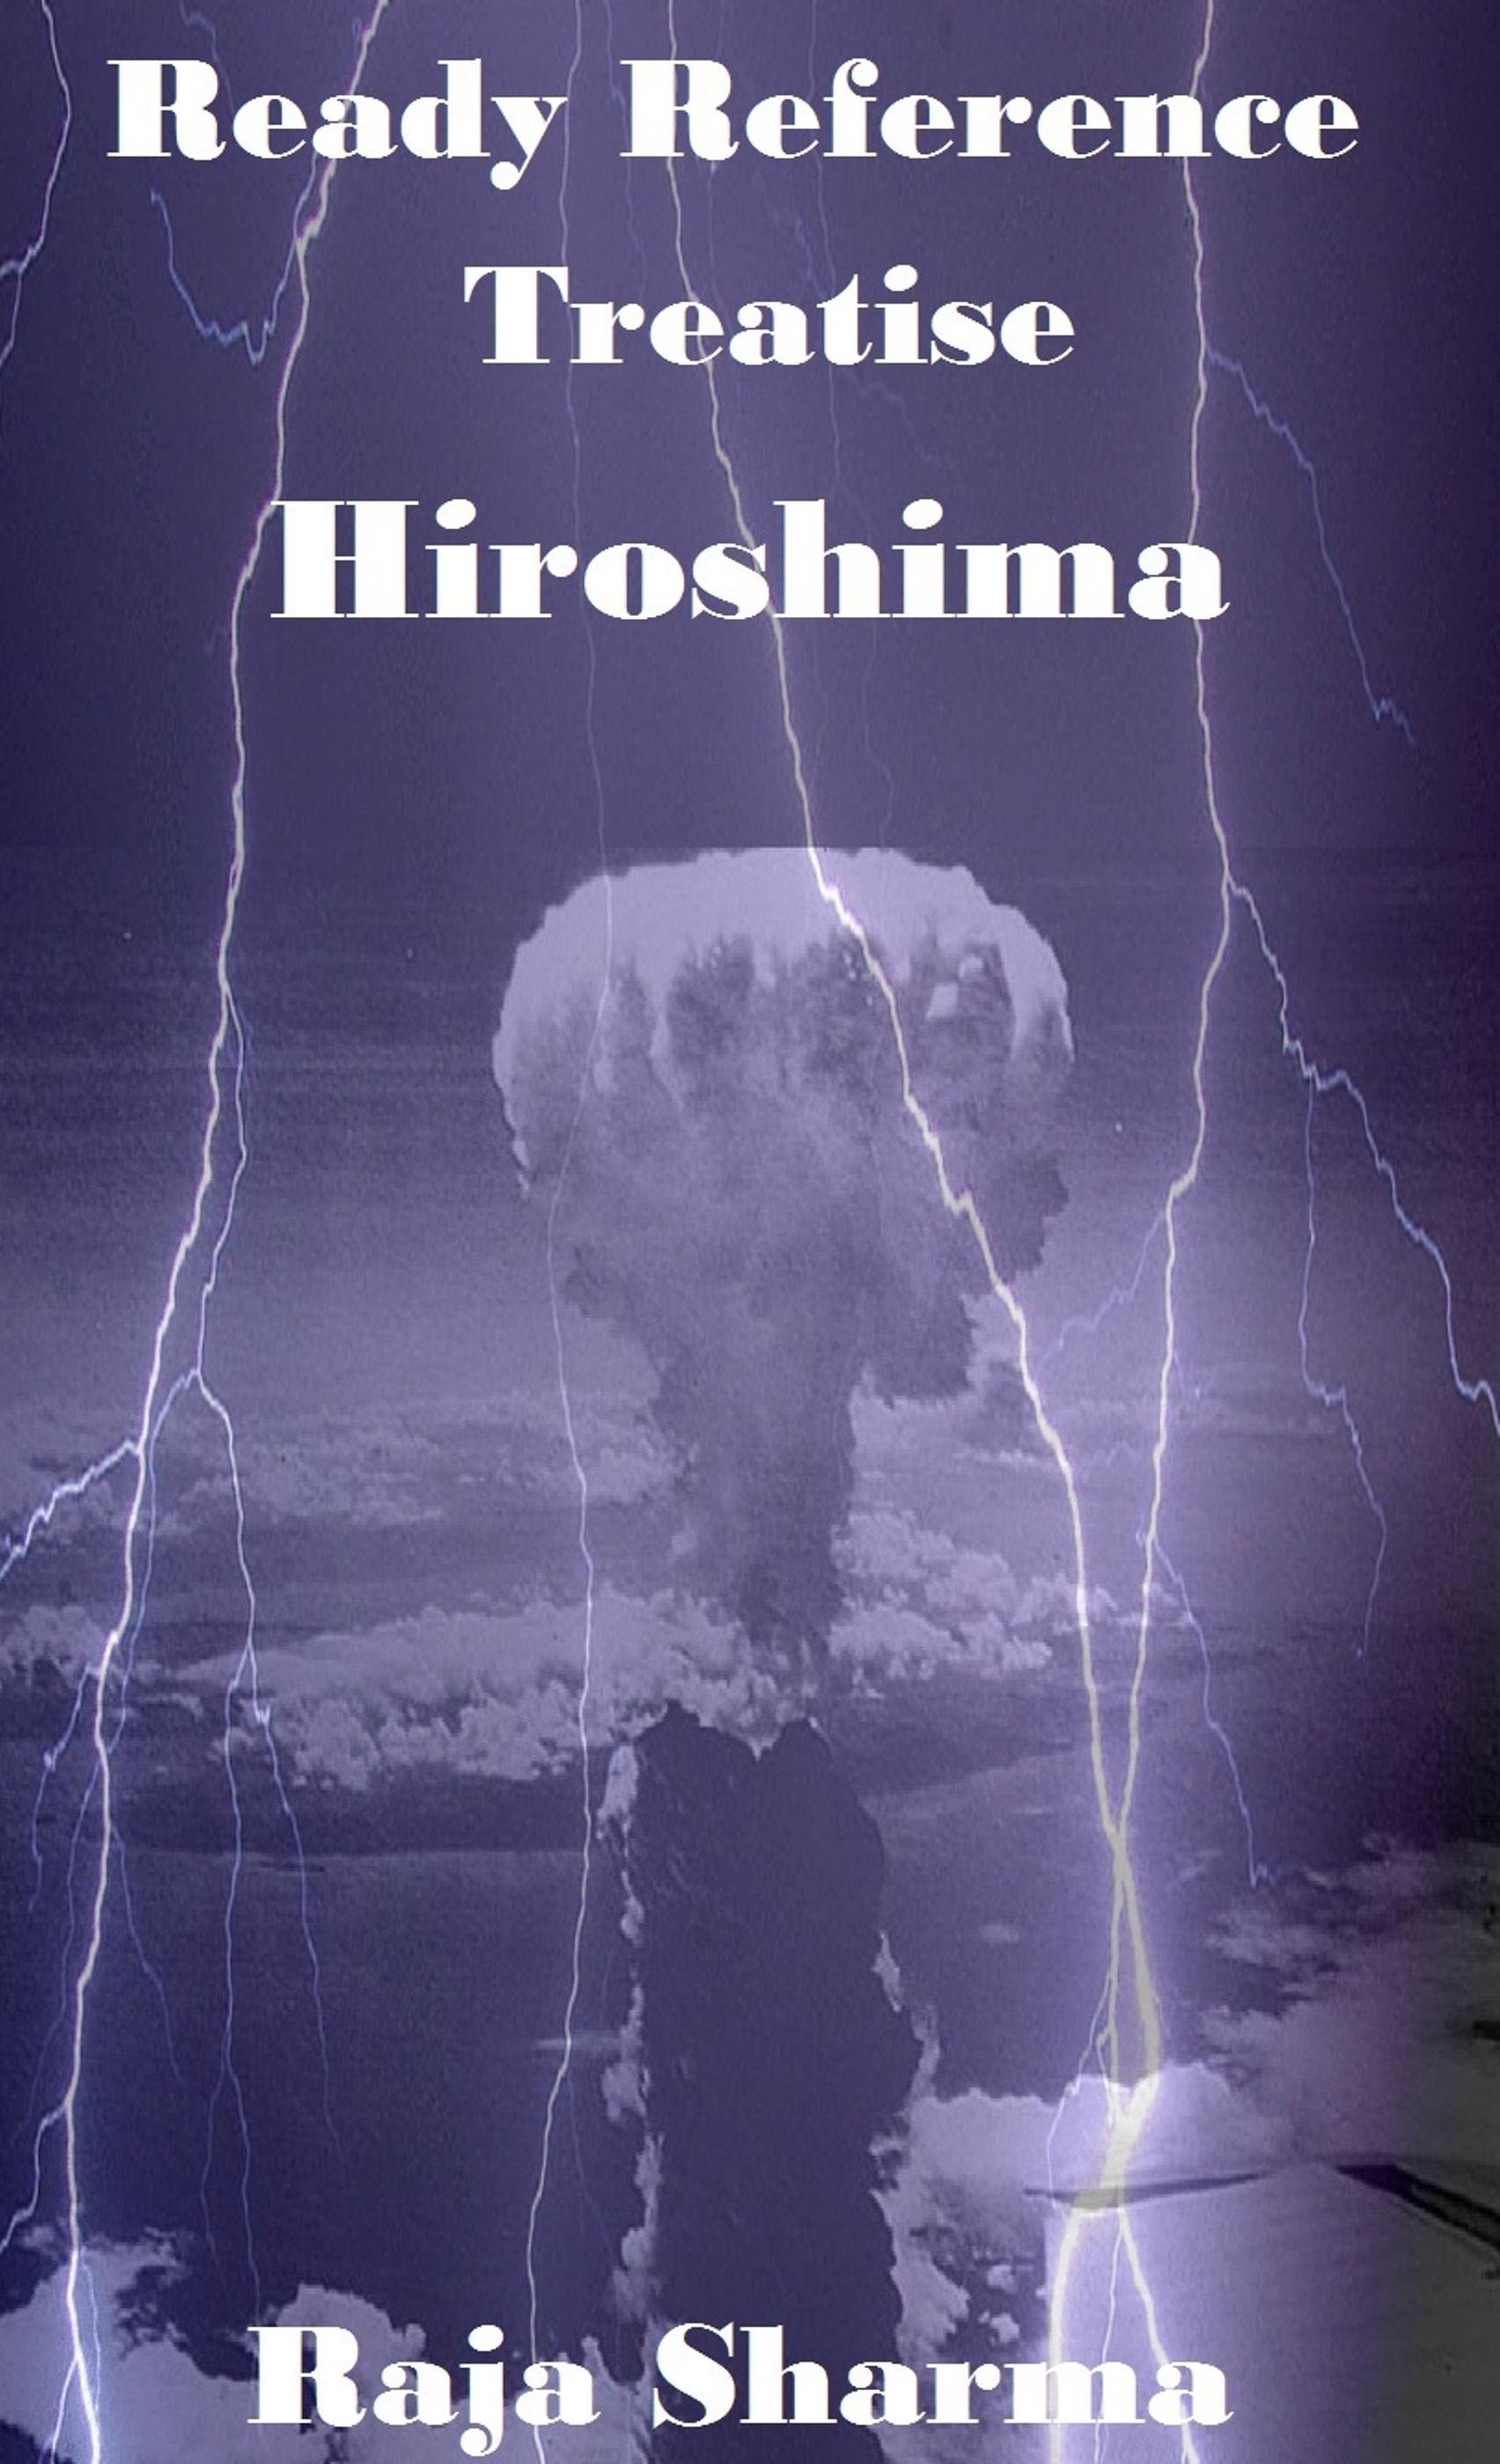 analysis of the novel hiroshima by pulitzer prize winning author john hersey A short john hersey biography describes john hersey's life, times  hiroshima john hersey contents plot overview + won the pulitzer prize.